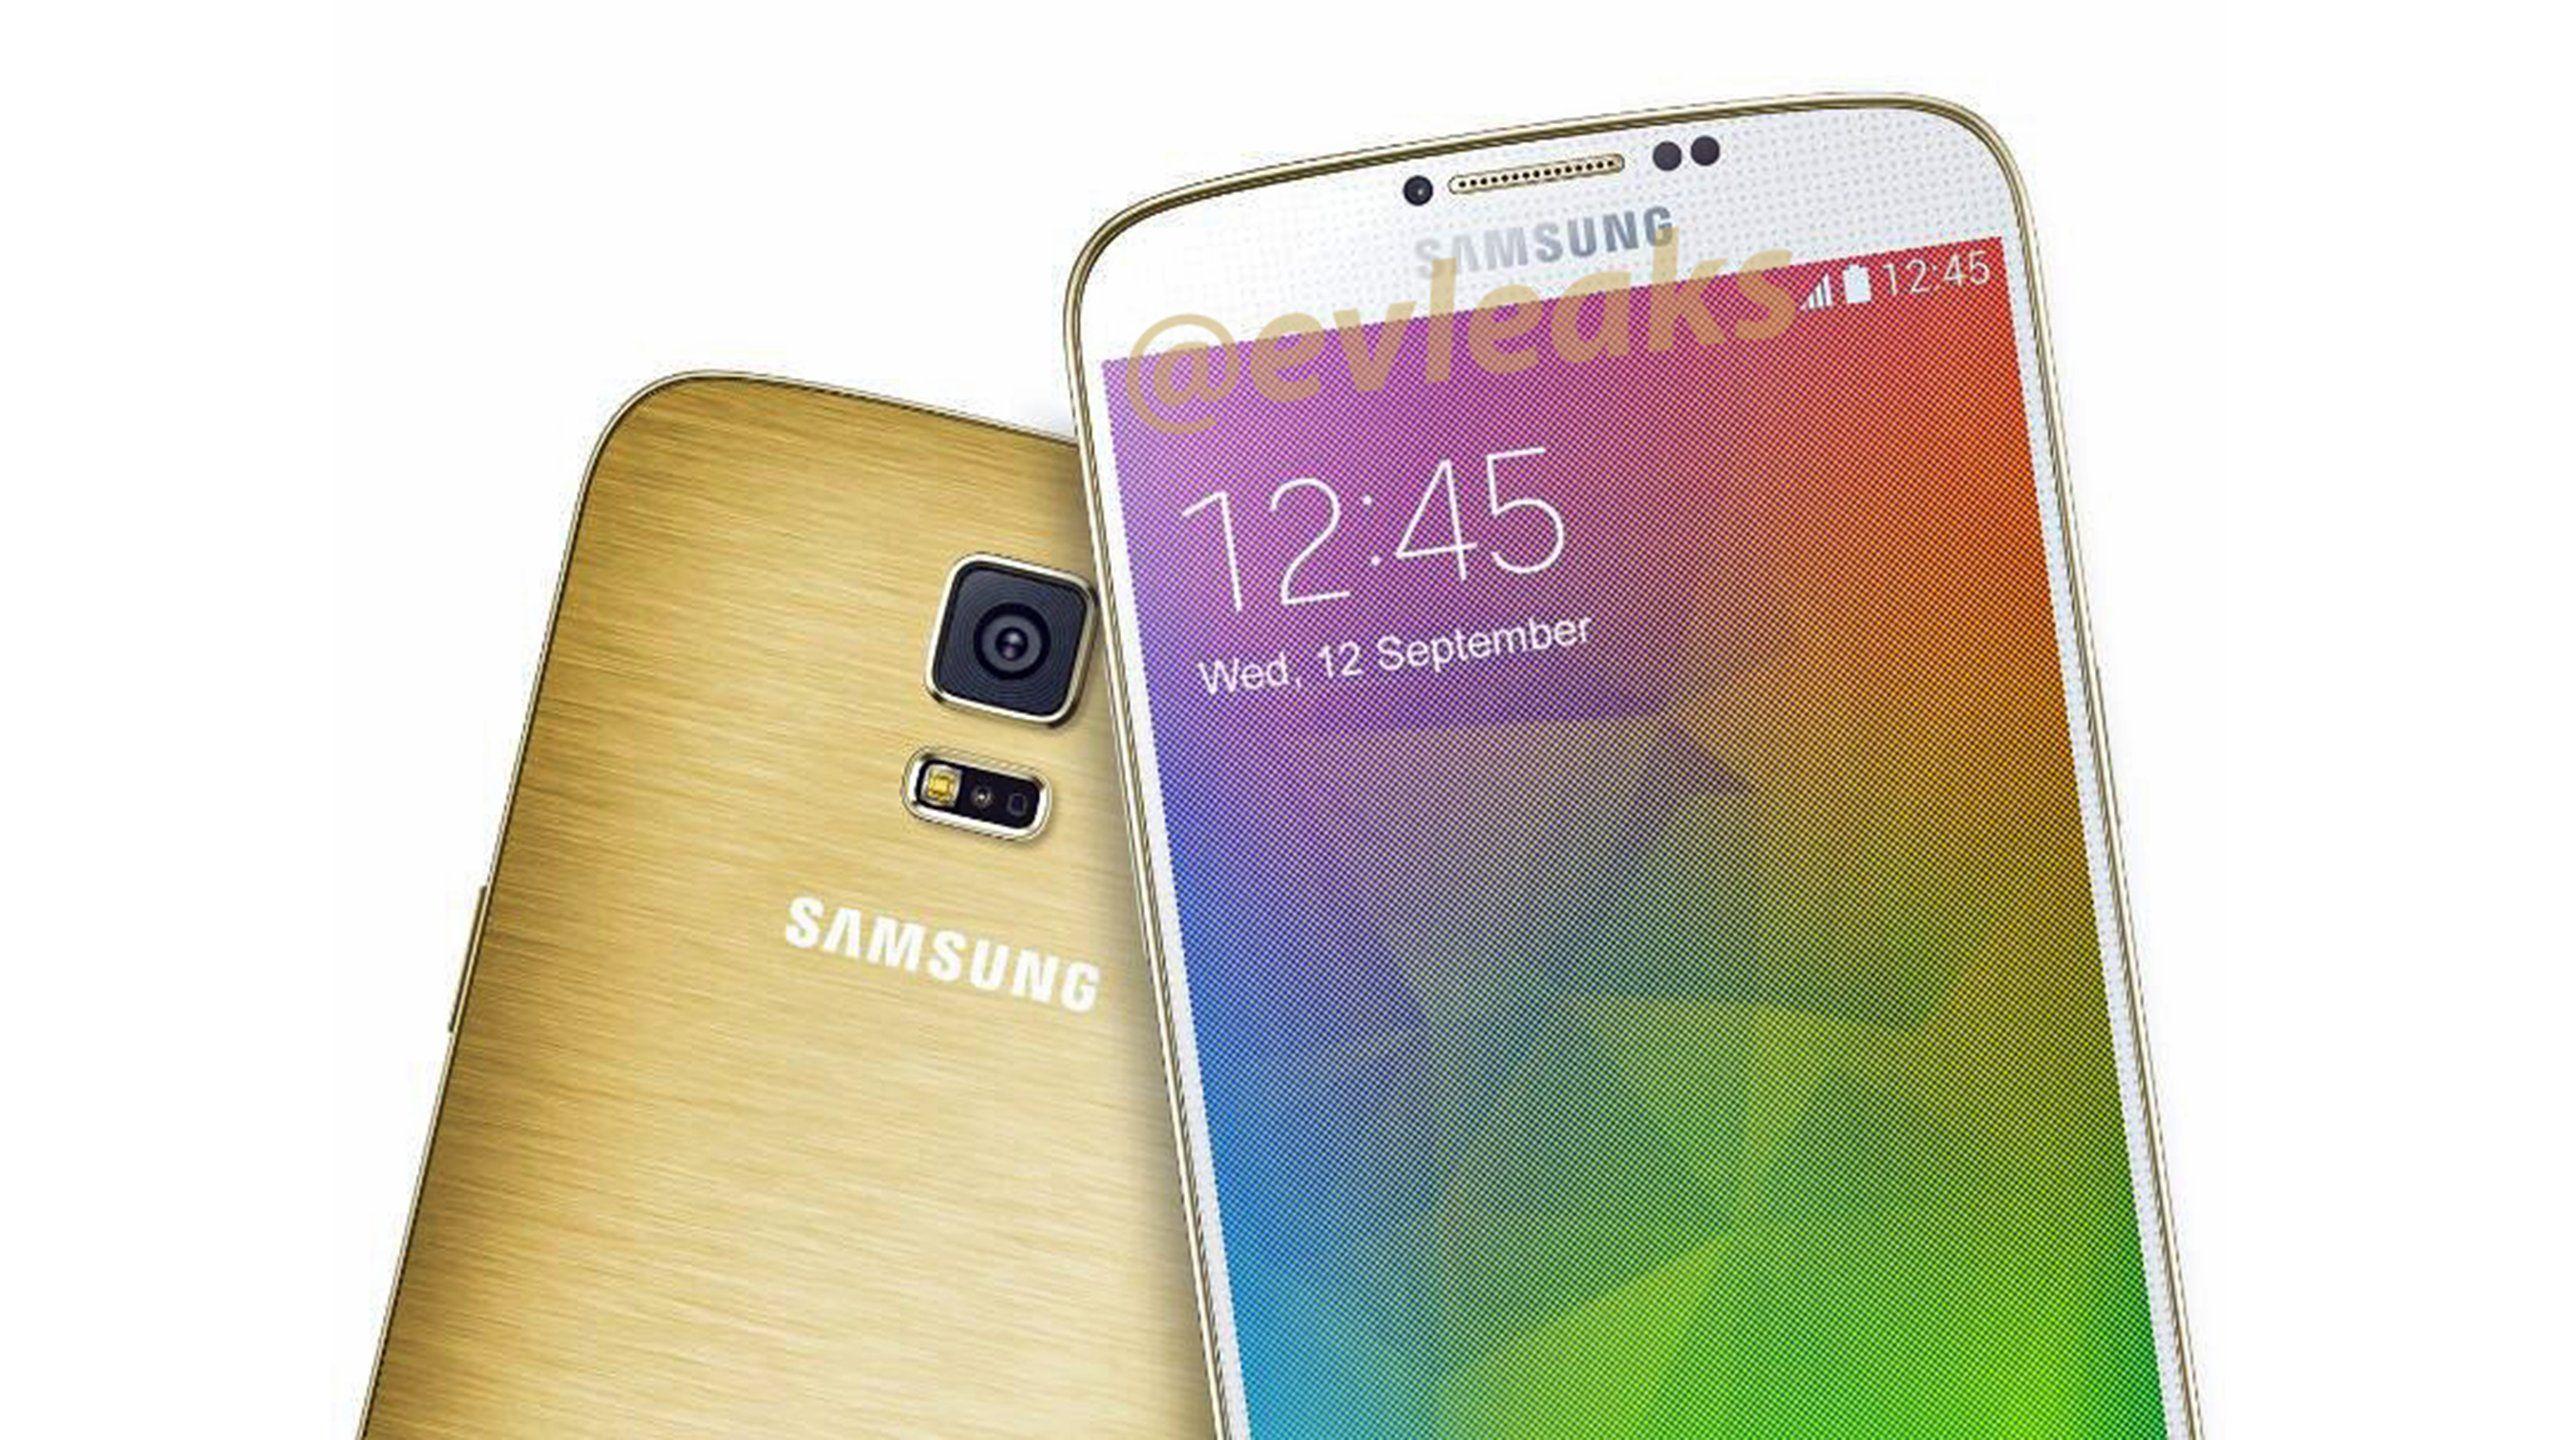 白與金雙色搭配款,Samsung GALAXY F 產品圖片曝光 - http://chinese.vr-zone.com/117822/samsung-galaxy-f-gold-smartphone-picture-leaked-06152014/